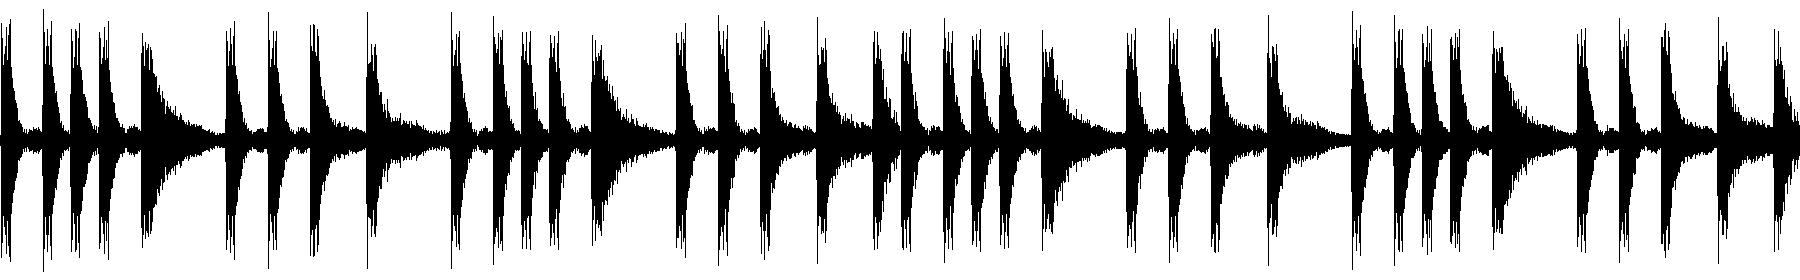 dts chordlp 18 dmaj7 wet